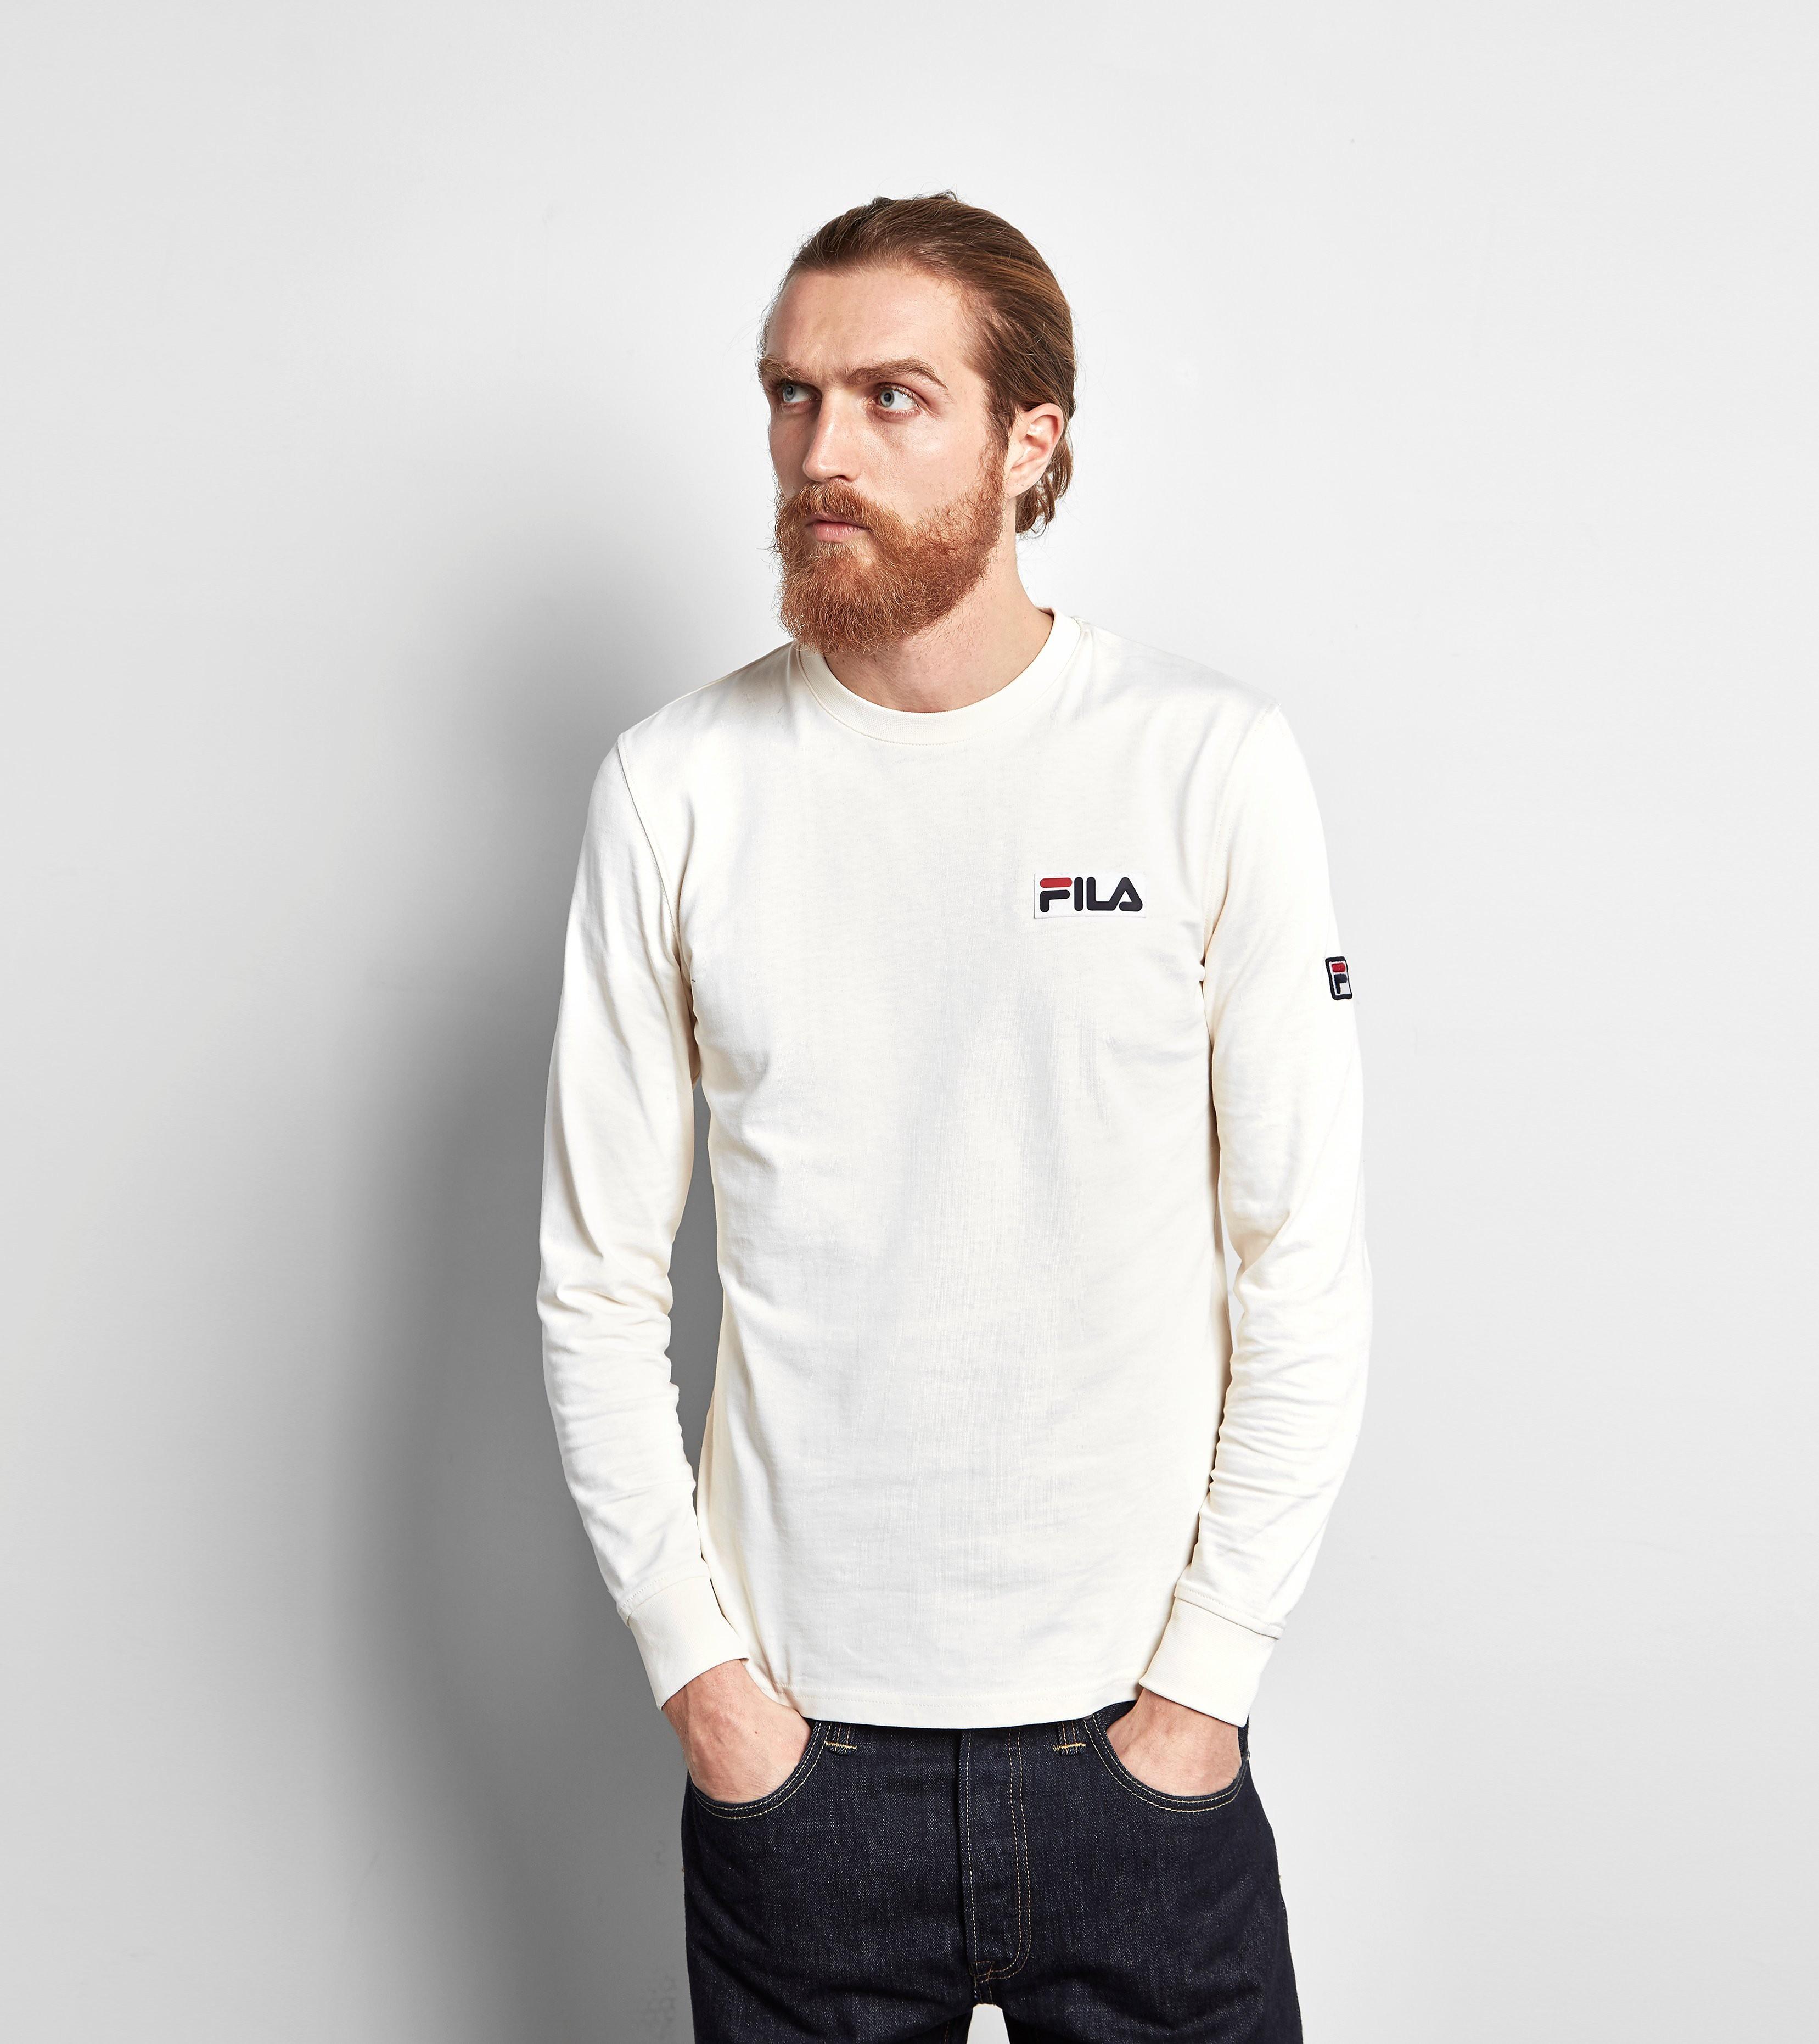 Fila Long-Sleeved Bow T-Shirt